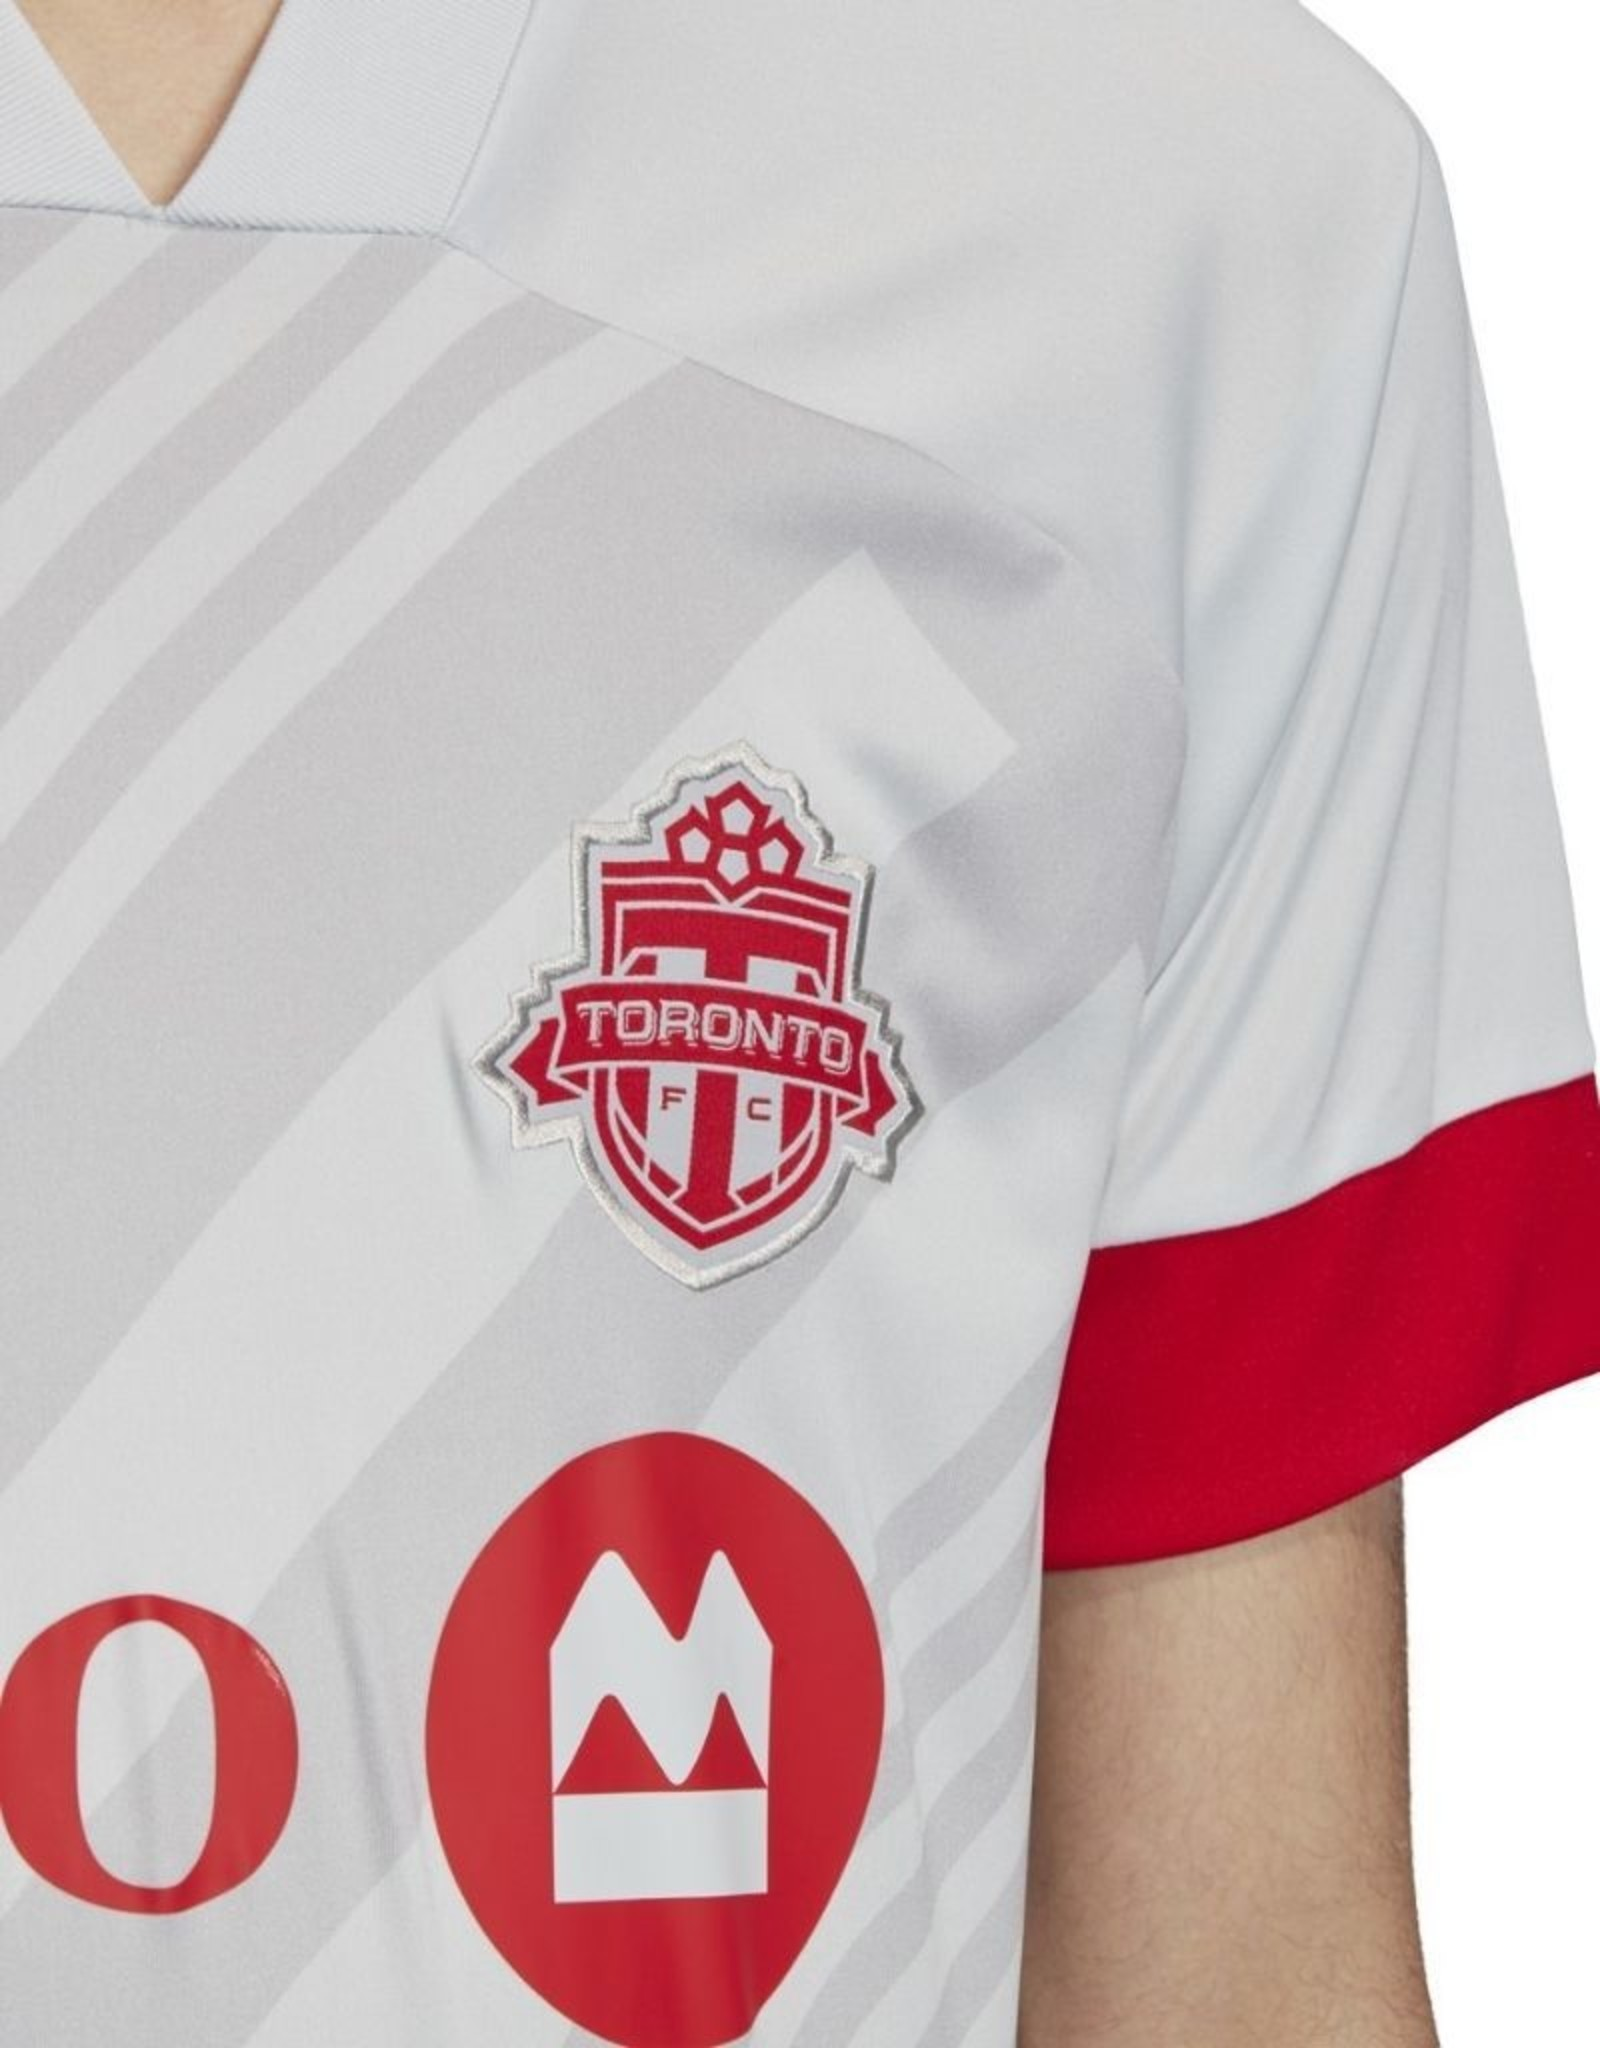 Adidas Adidas '20 Soccer Jersey Toronto FC Grey